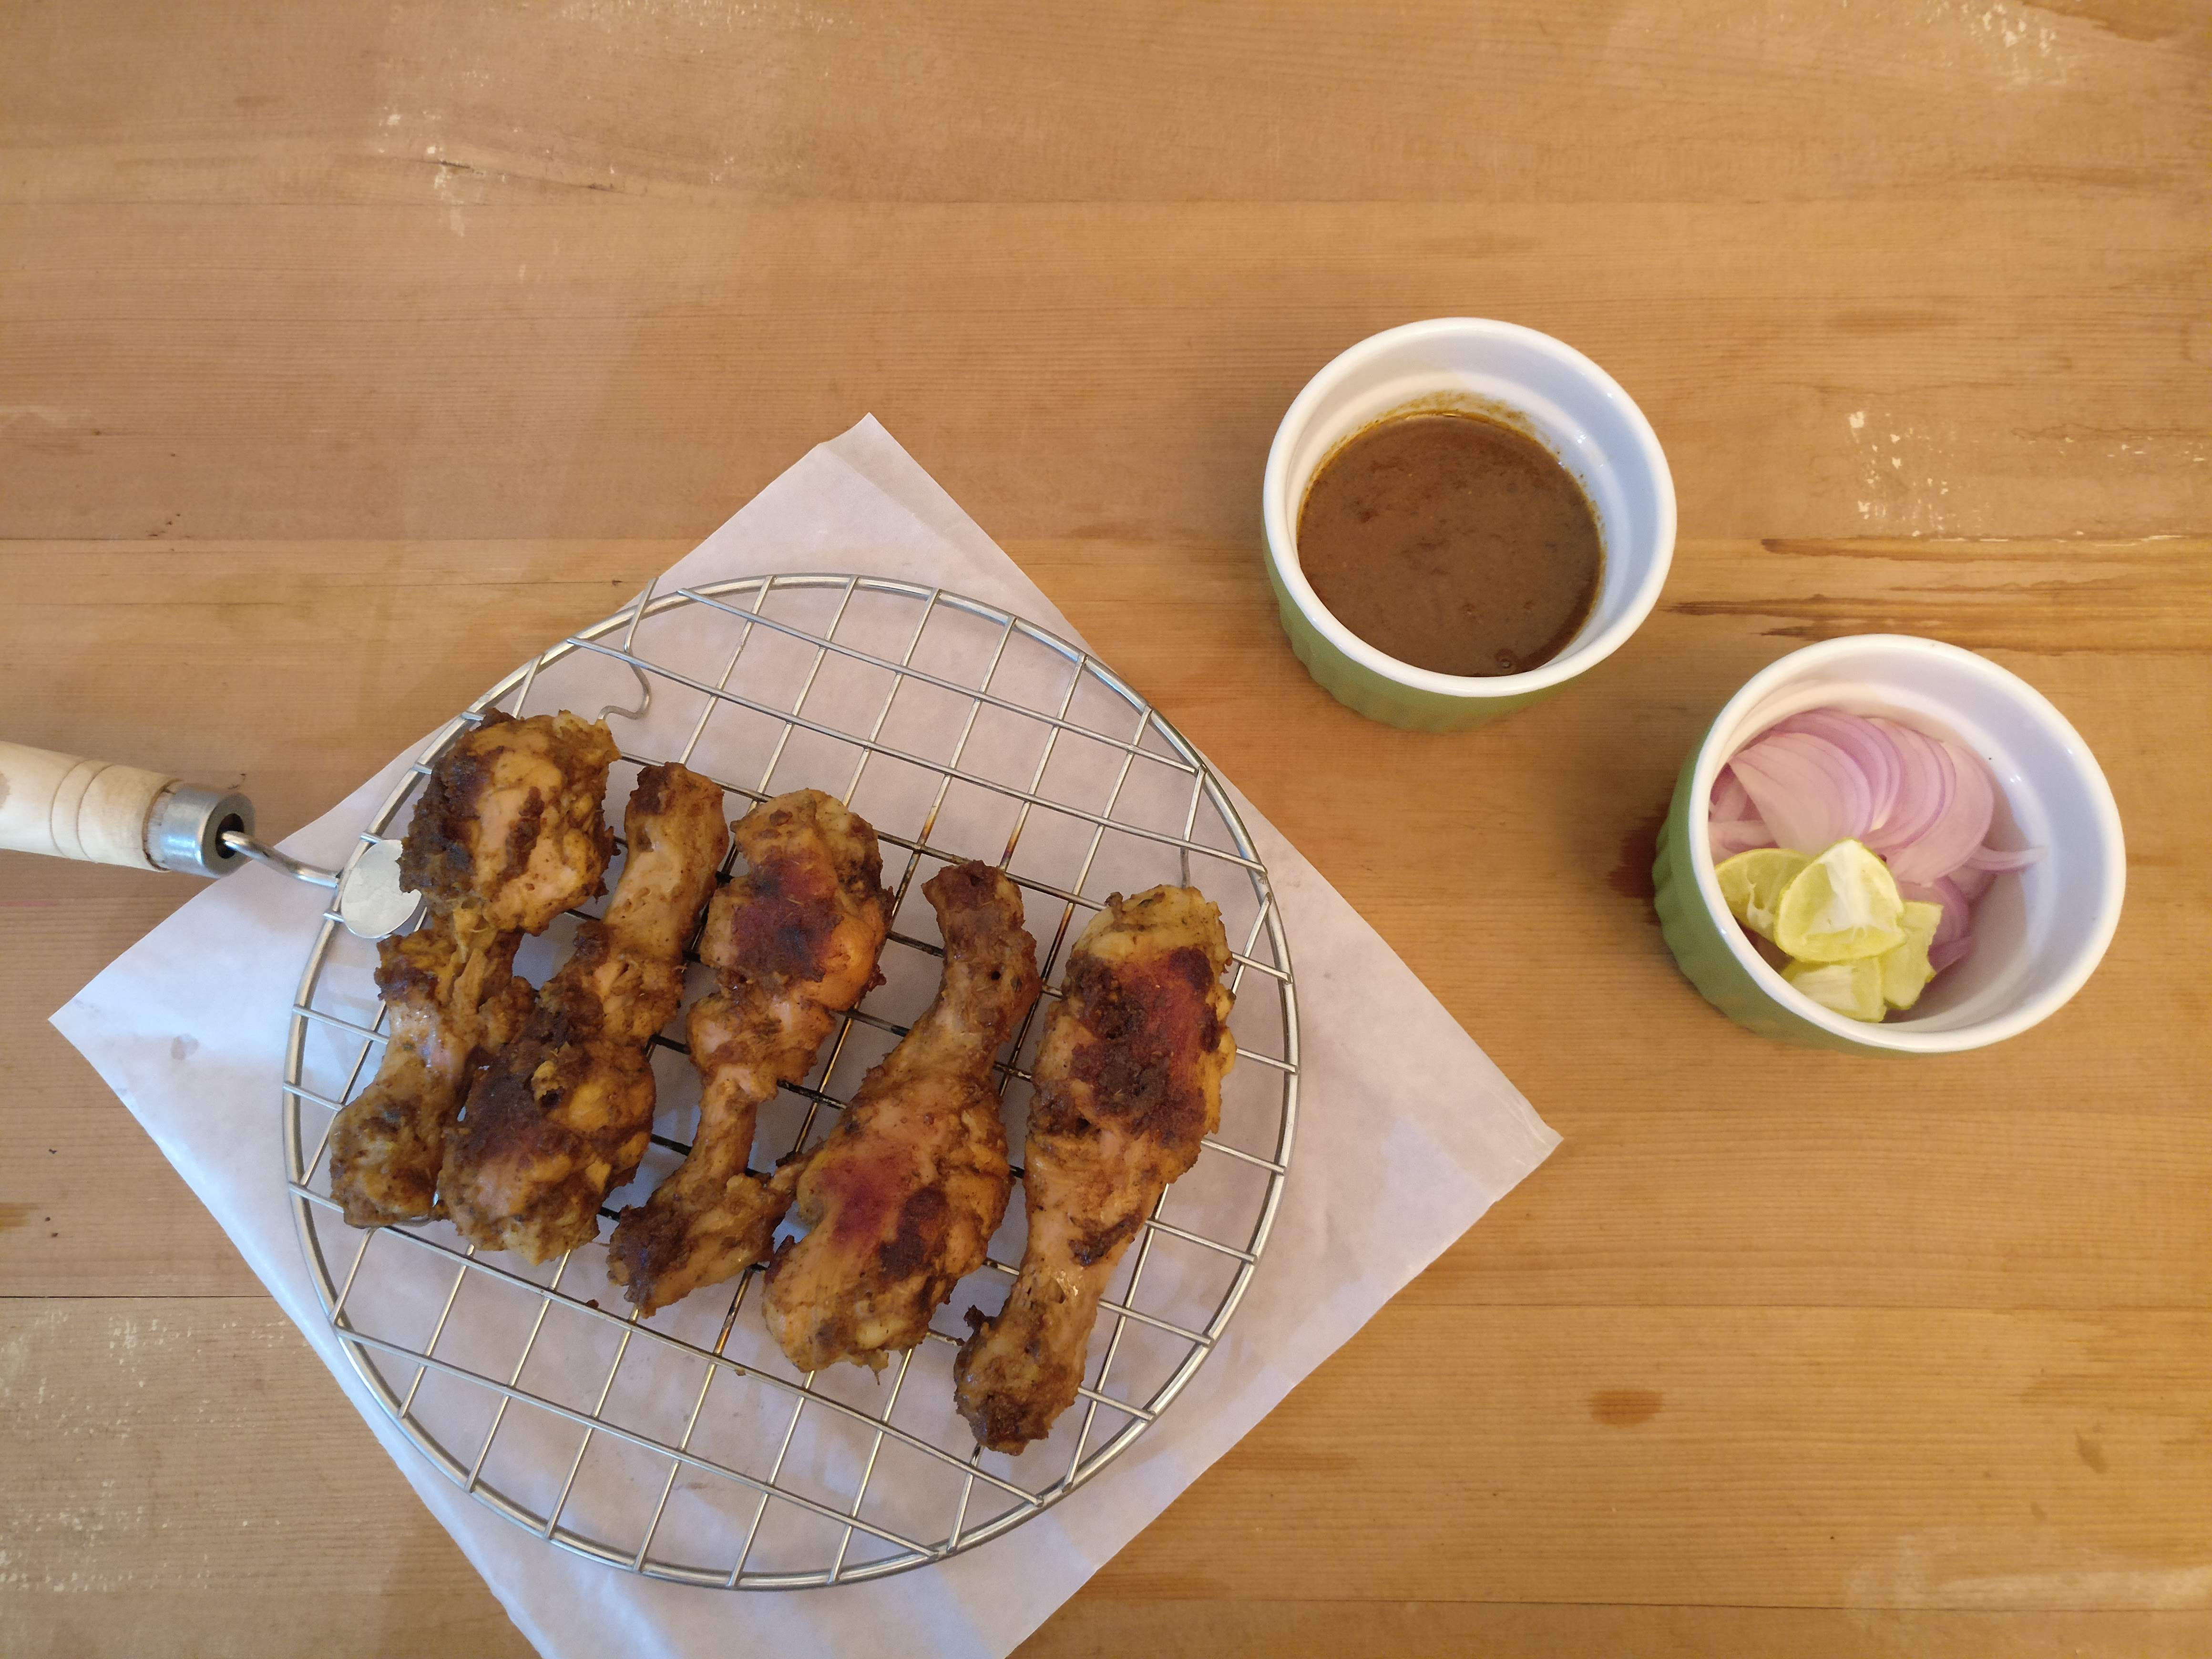 Chicken Drumsticks with Fajita Seasoning